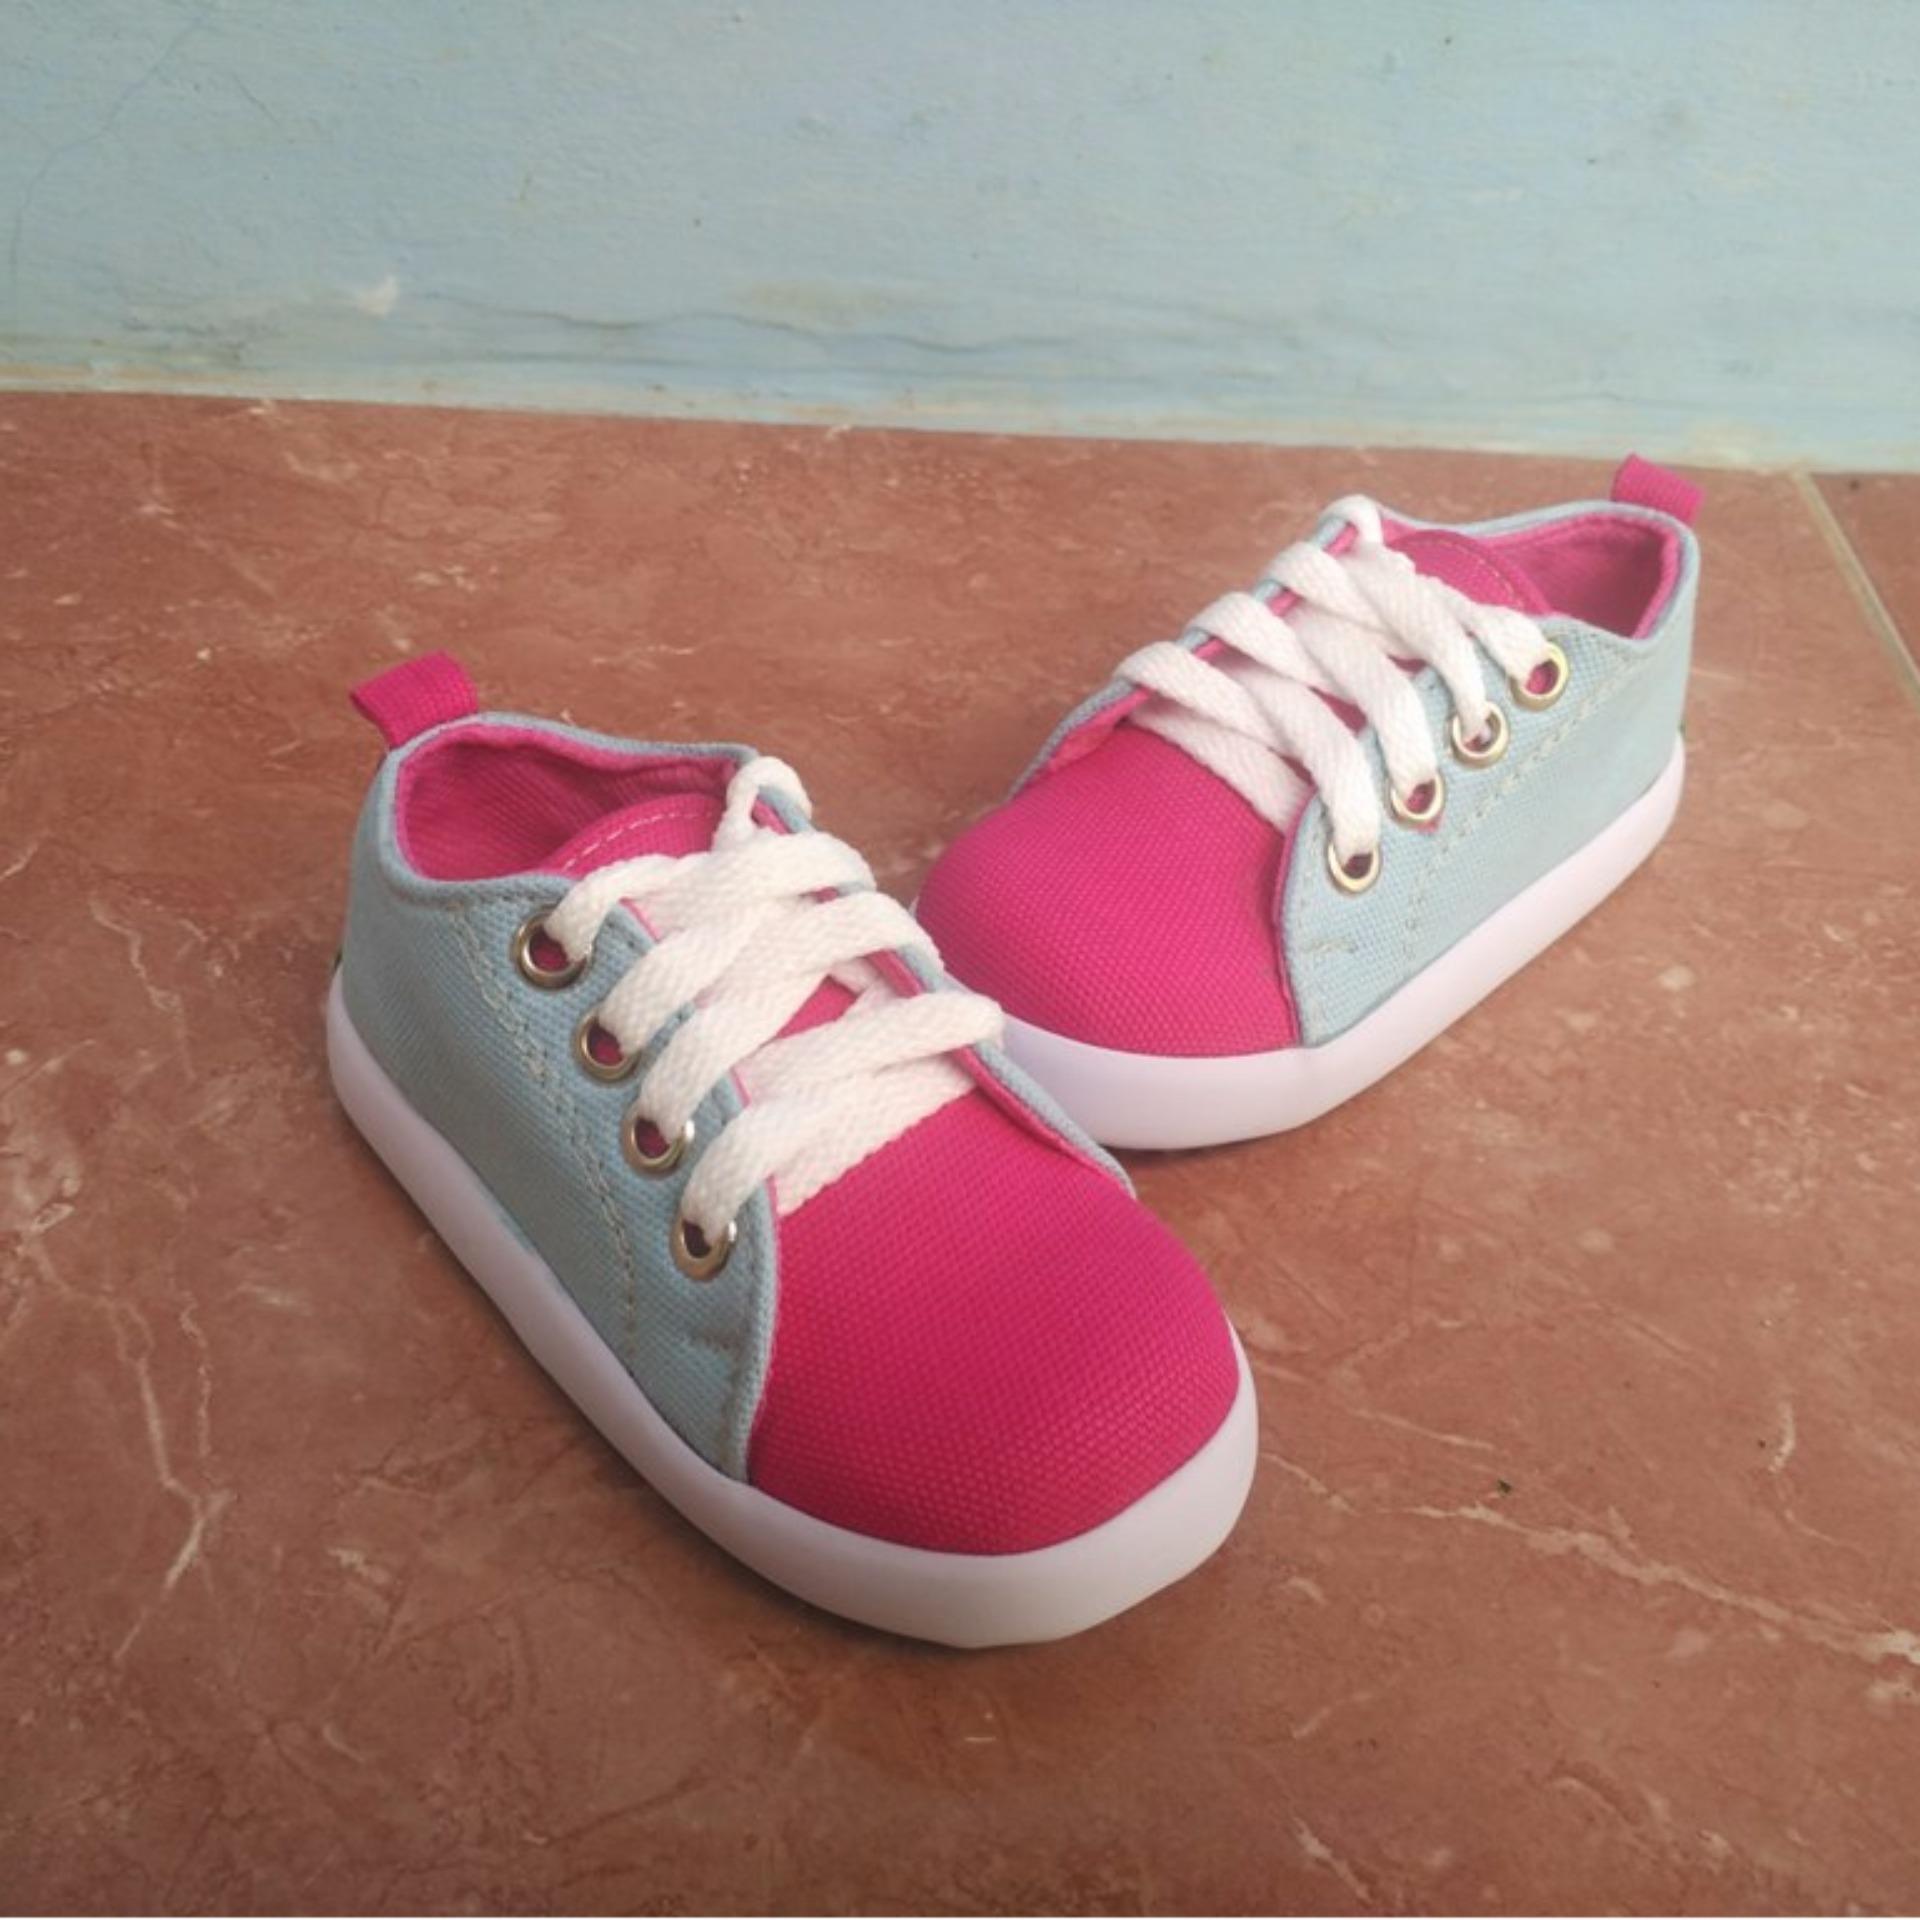 Jual Sepatu Sneaker Anak Perempuan Biru Pink Lucu By Shuku Shuku Grosir